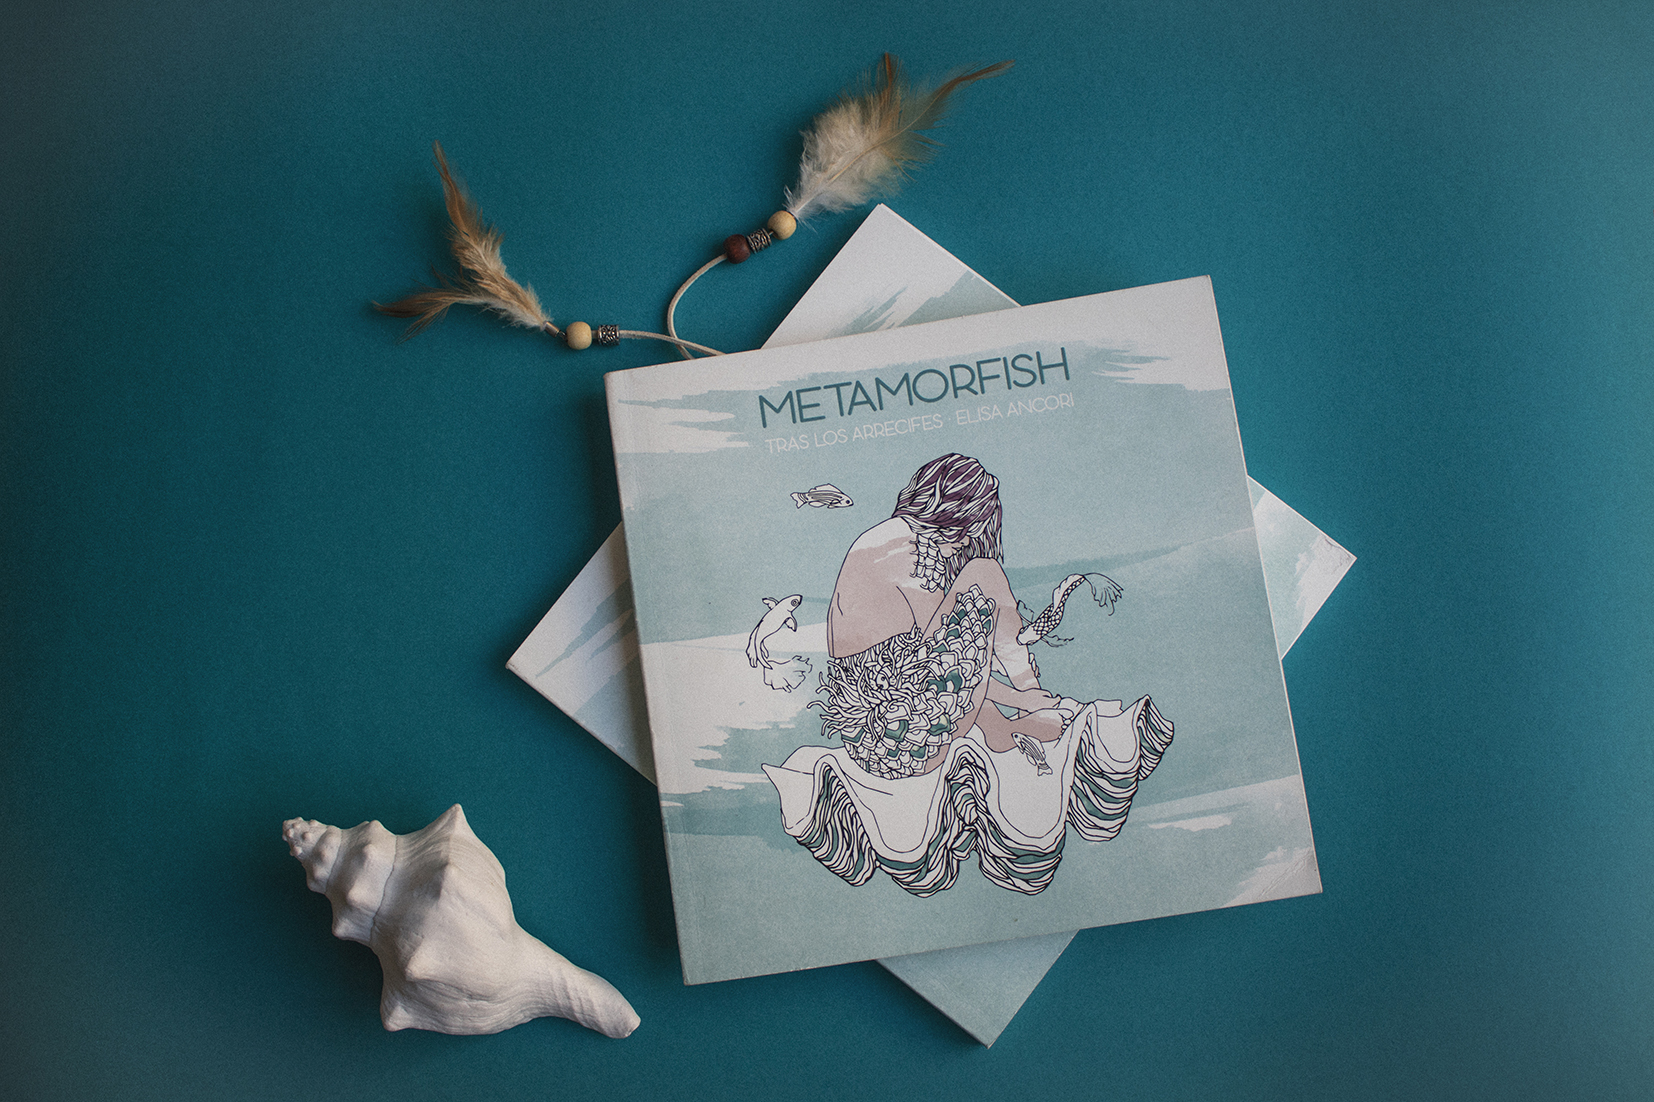 metamorfish_libro_elisaancori16.jpg